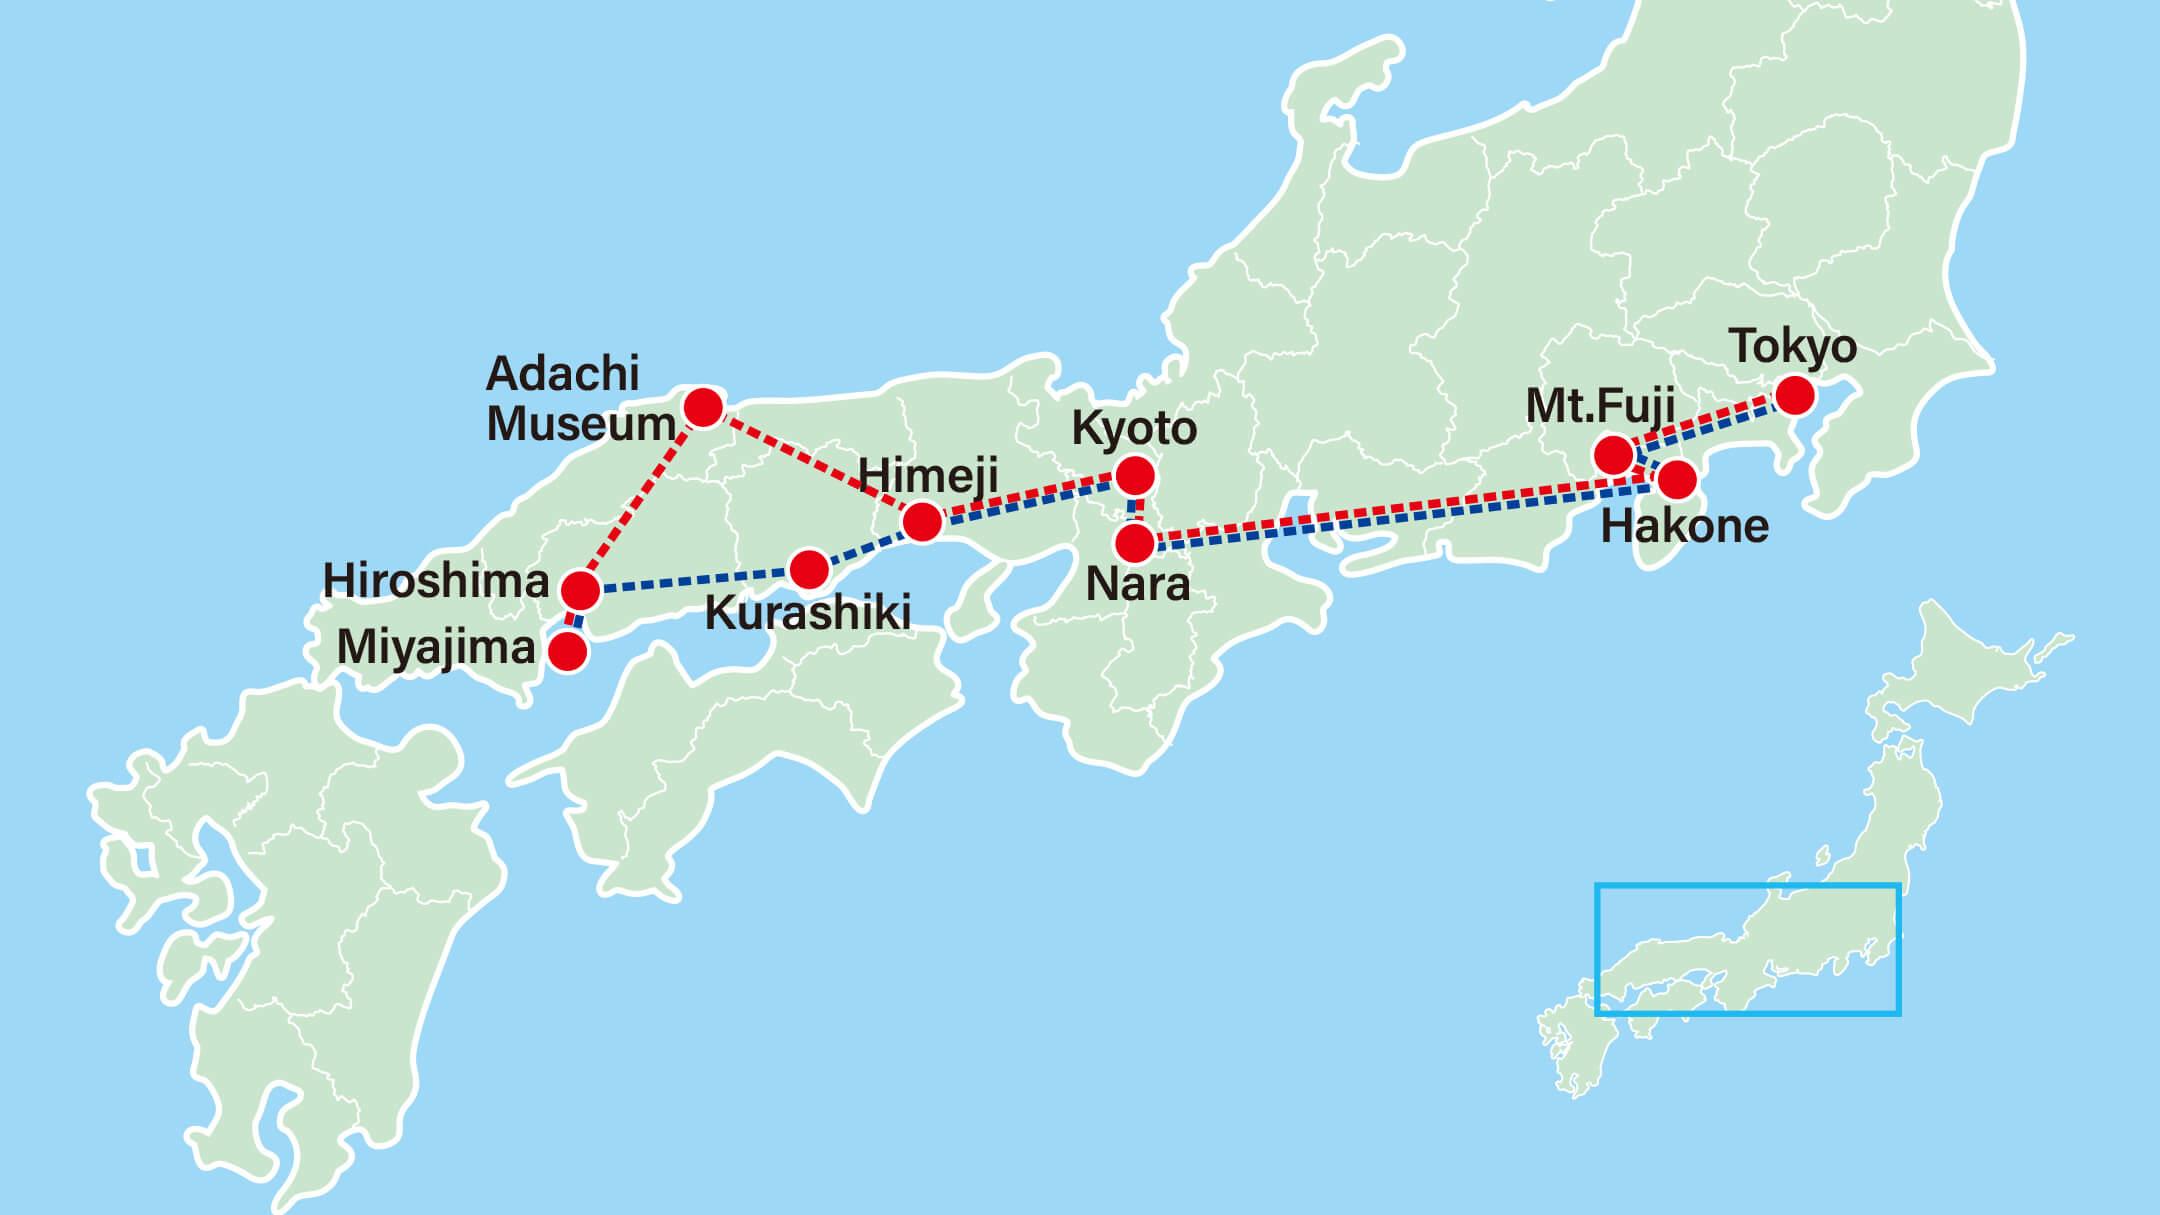 Best of Japan Tour 9 Days Vacation-Hiroshima-Kyoto-Nara-Mt Fuji-Hakone-Tokyo